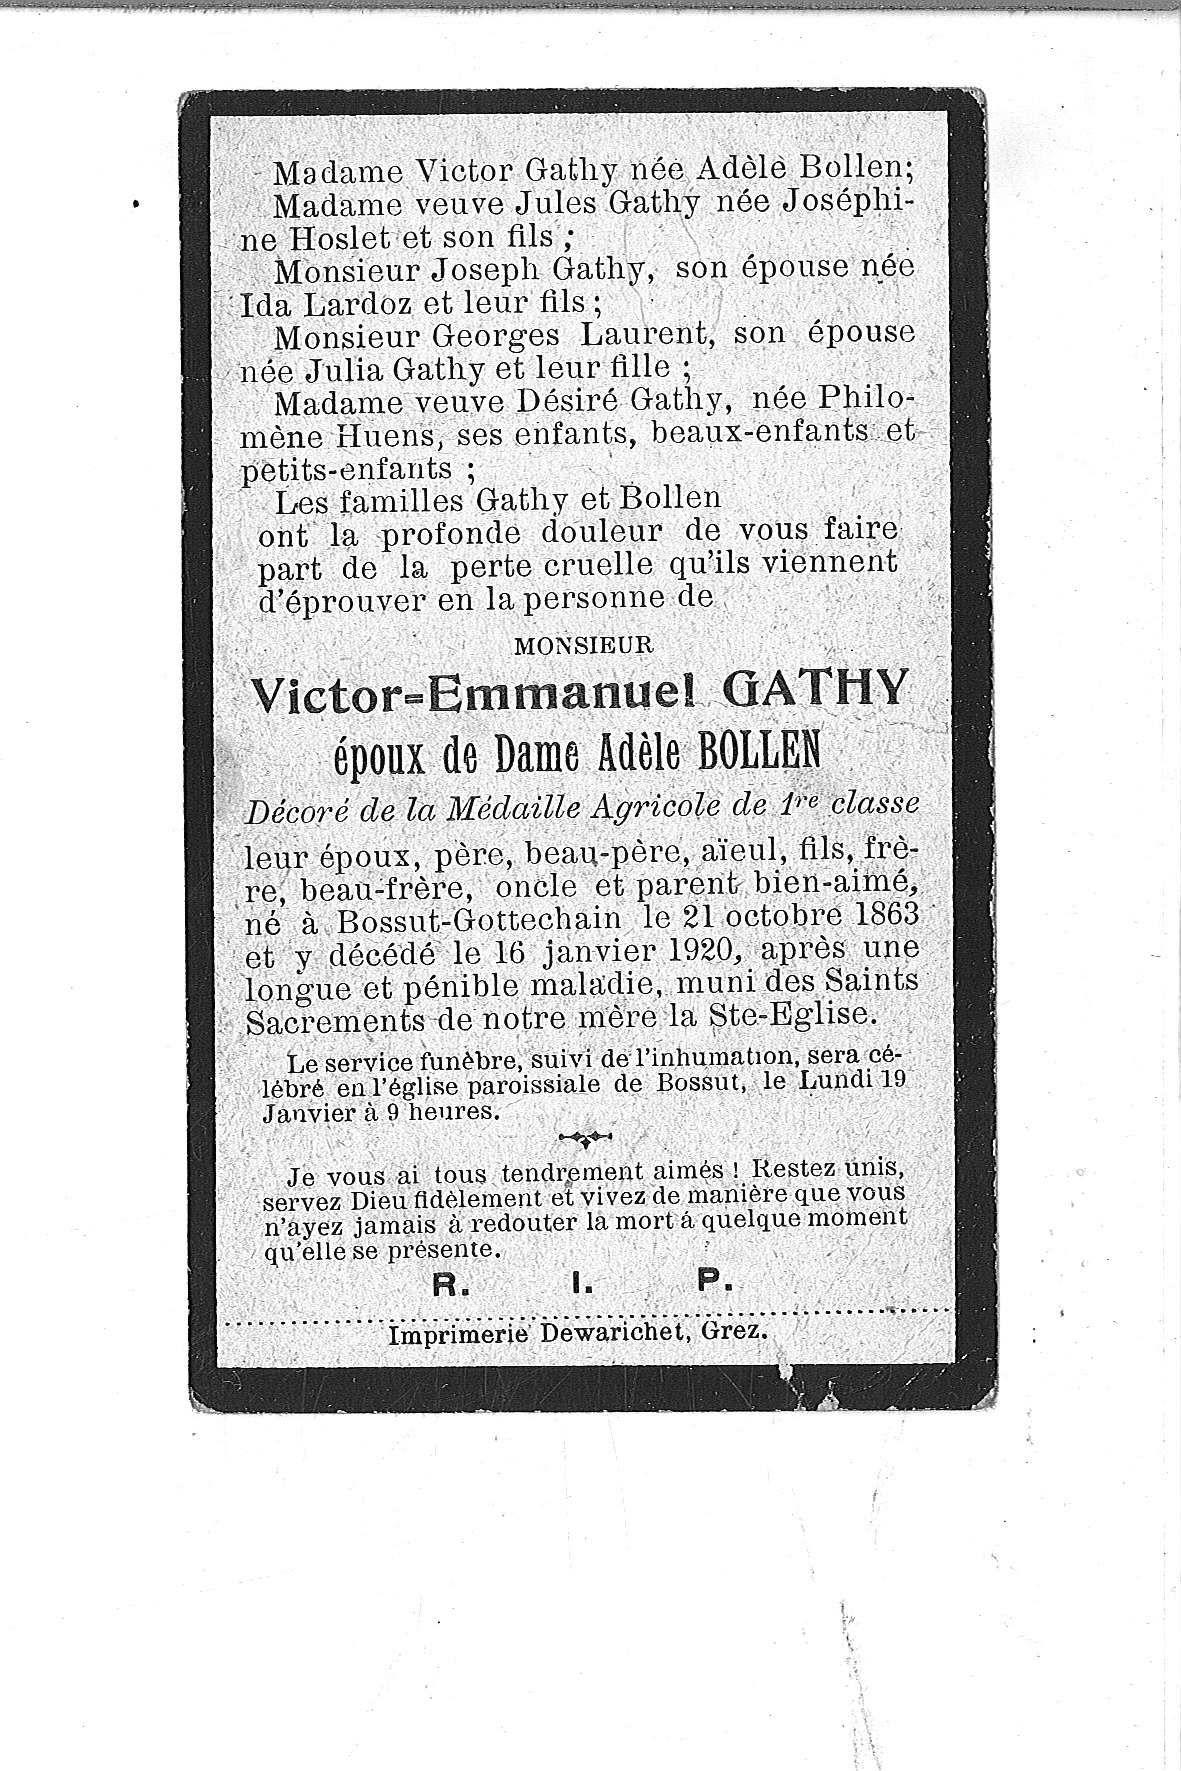 Victor-Emmanuel(1920).jpg